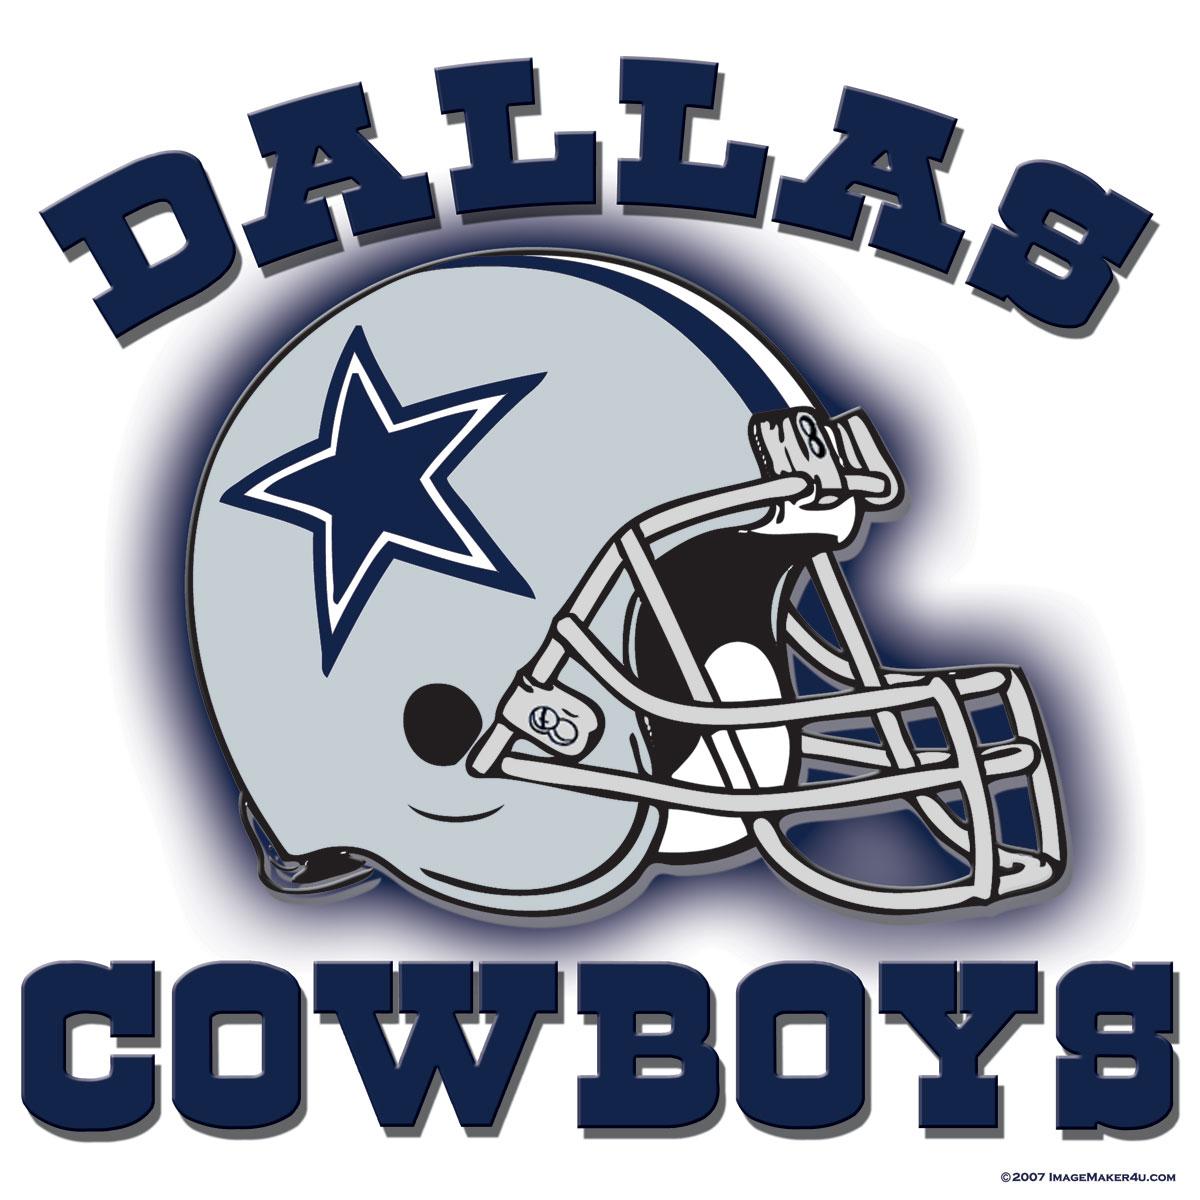 Nfl cowboys clipart - .